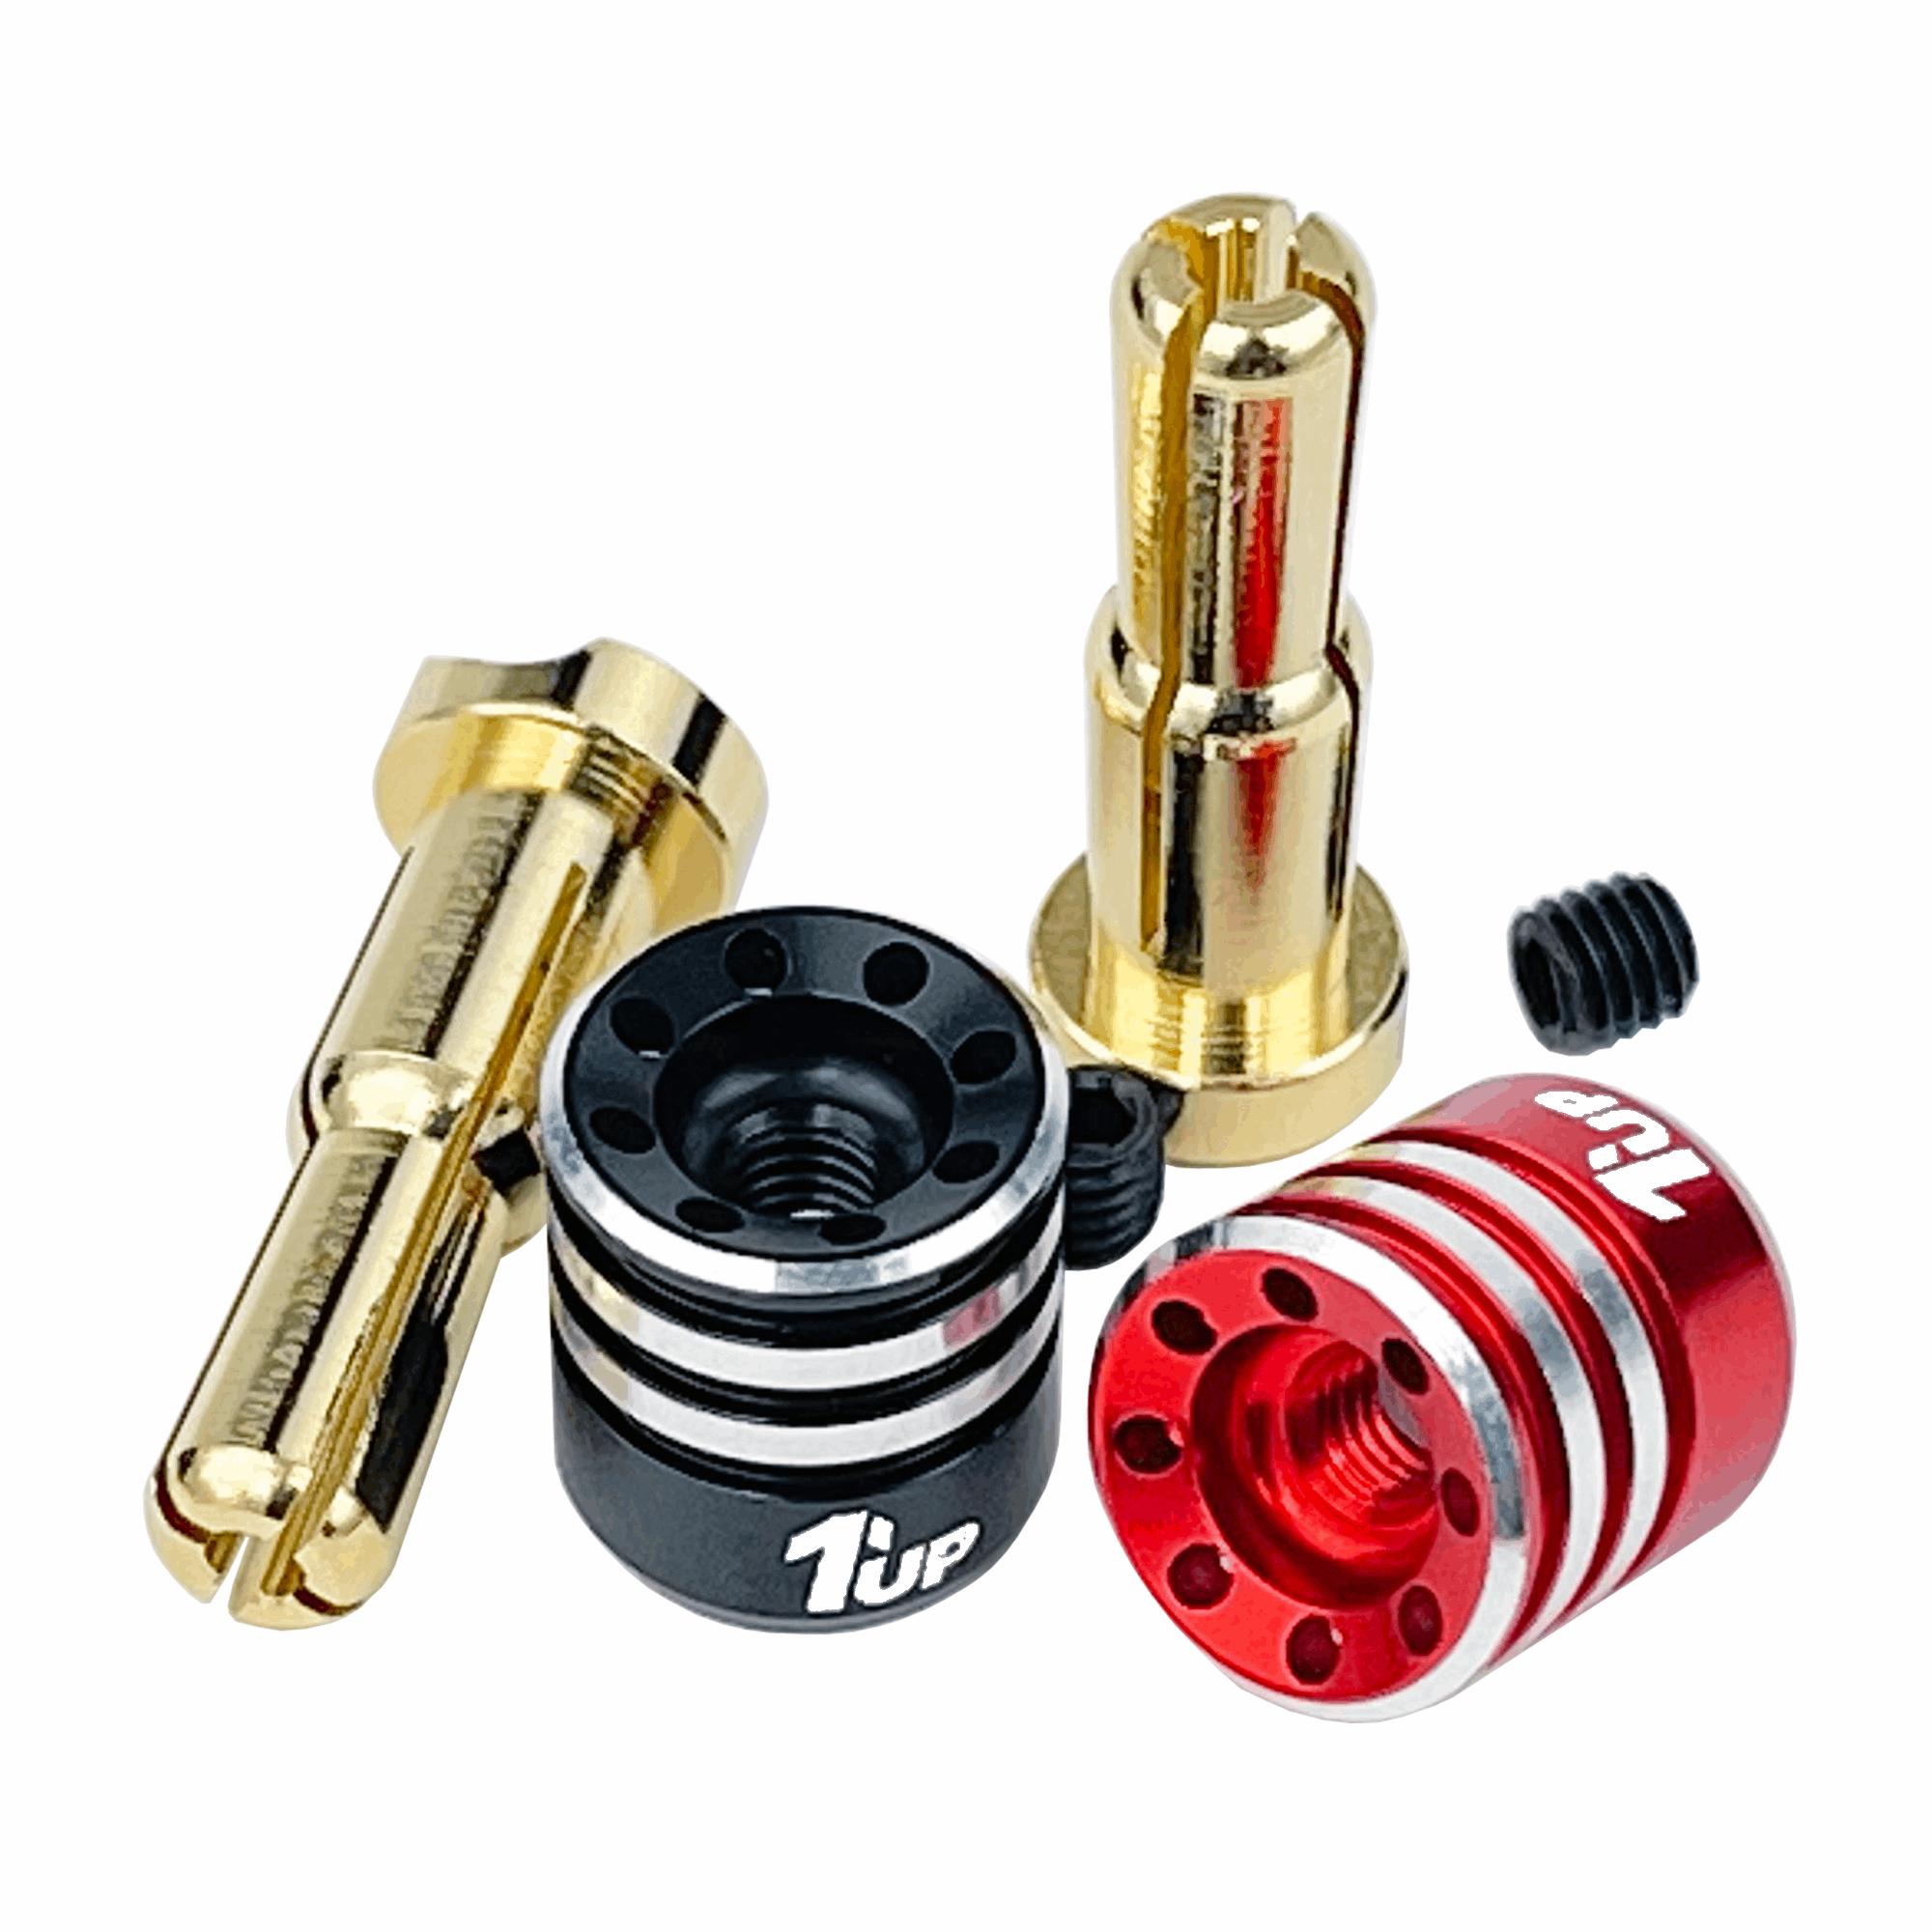 1up Racing Heatsink Bullet Plugs - 4/5mm Stepped (2pcs)